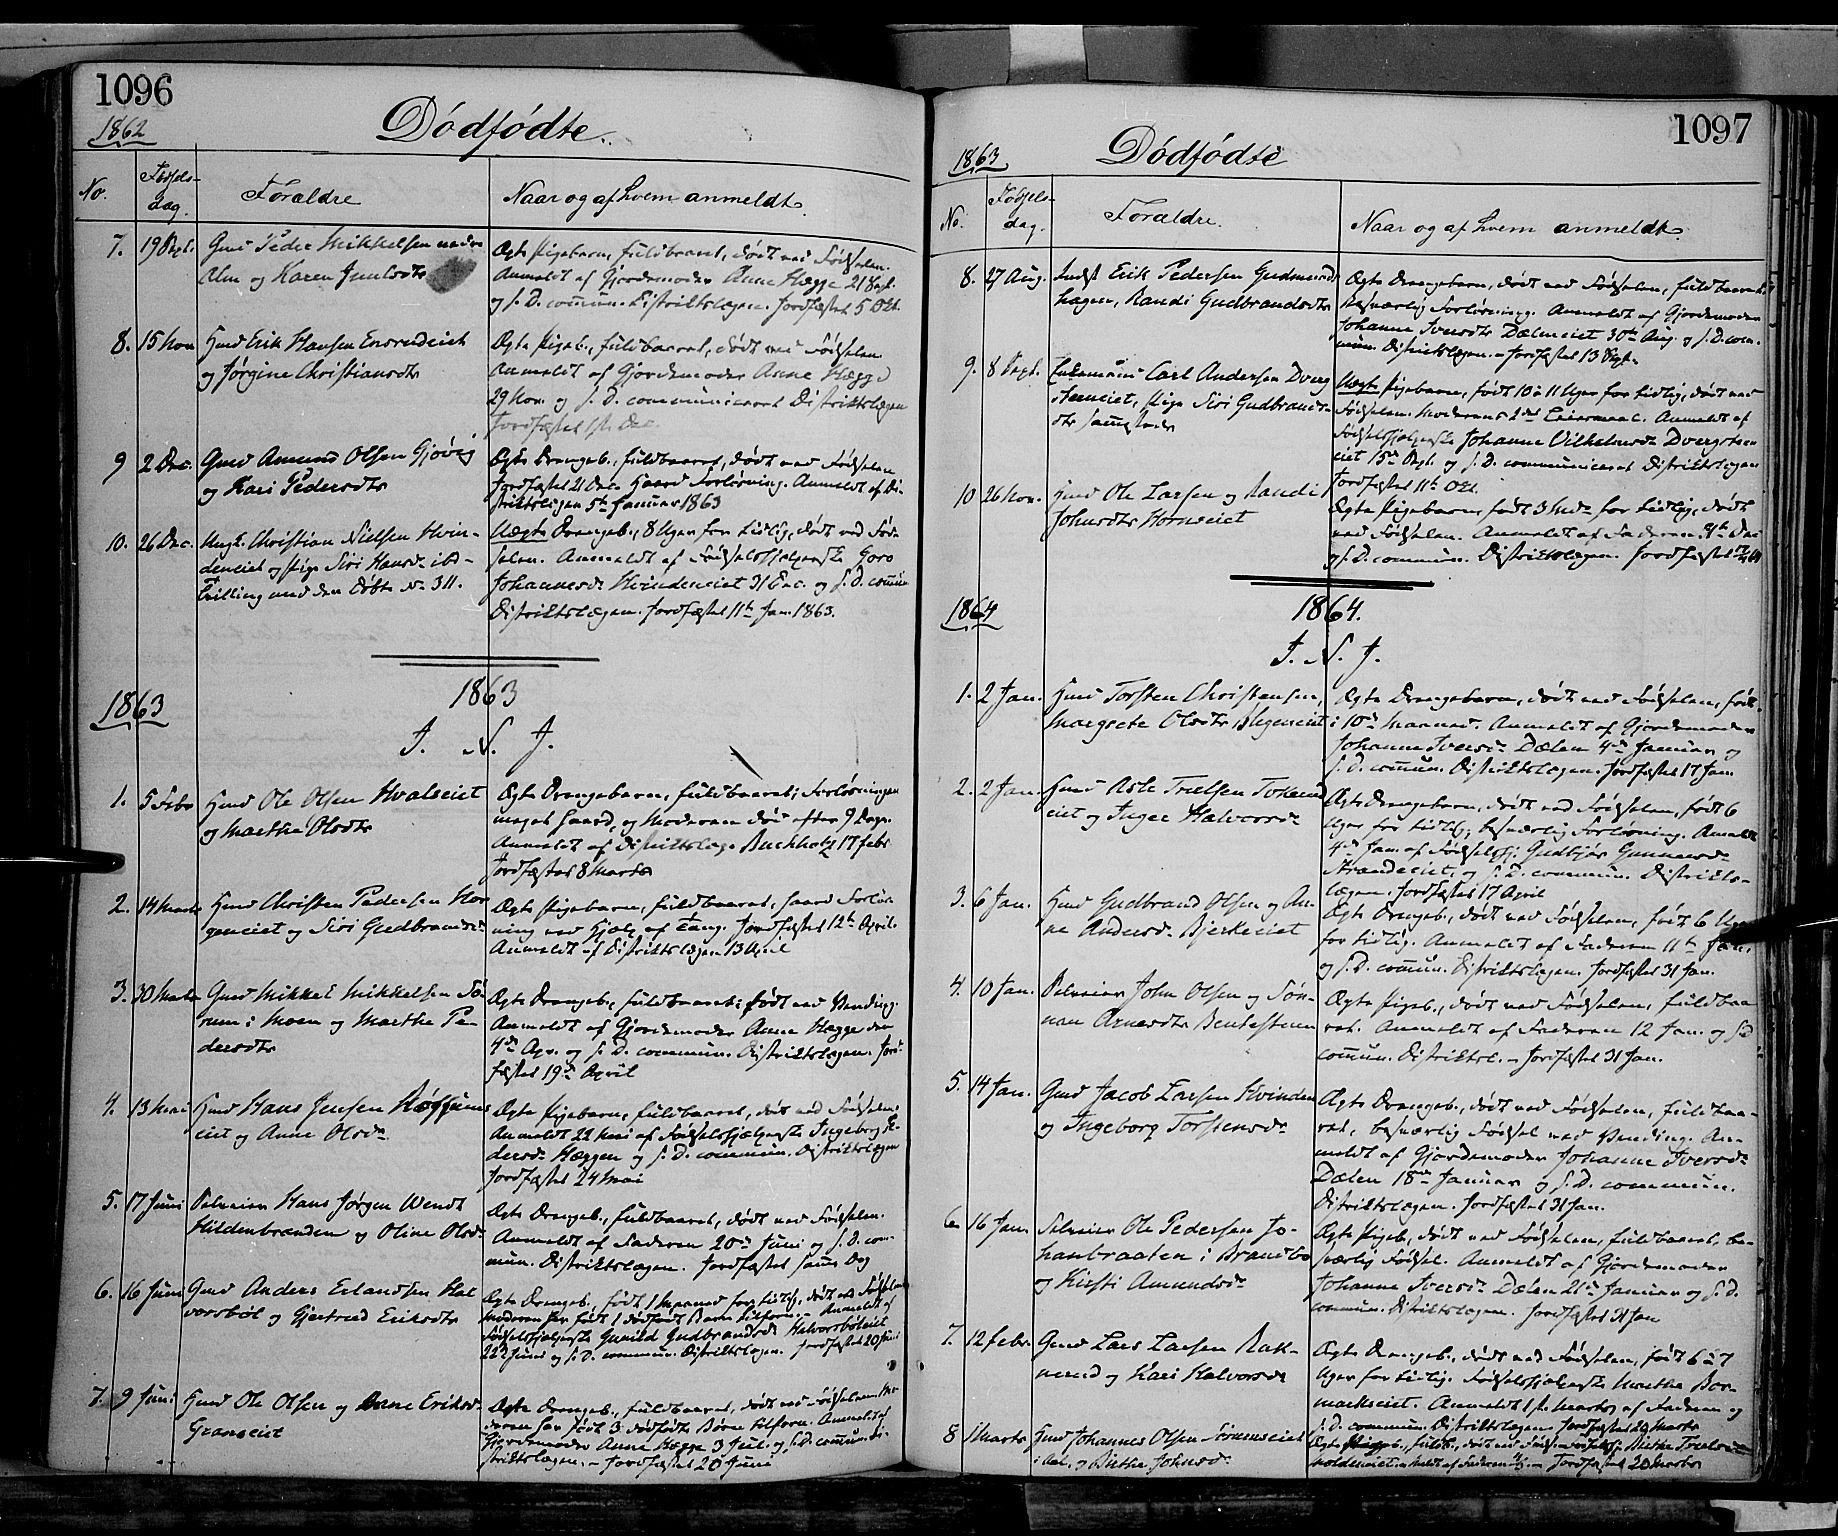 SAH, Gran prestekontor, Ministerialbok nr. 12, 1856-1874, s. 1096-1097